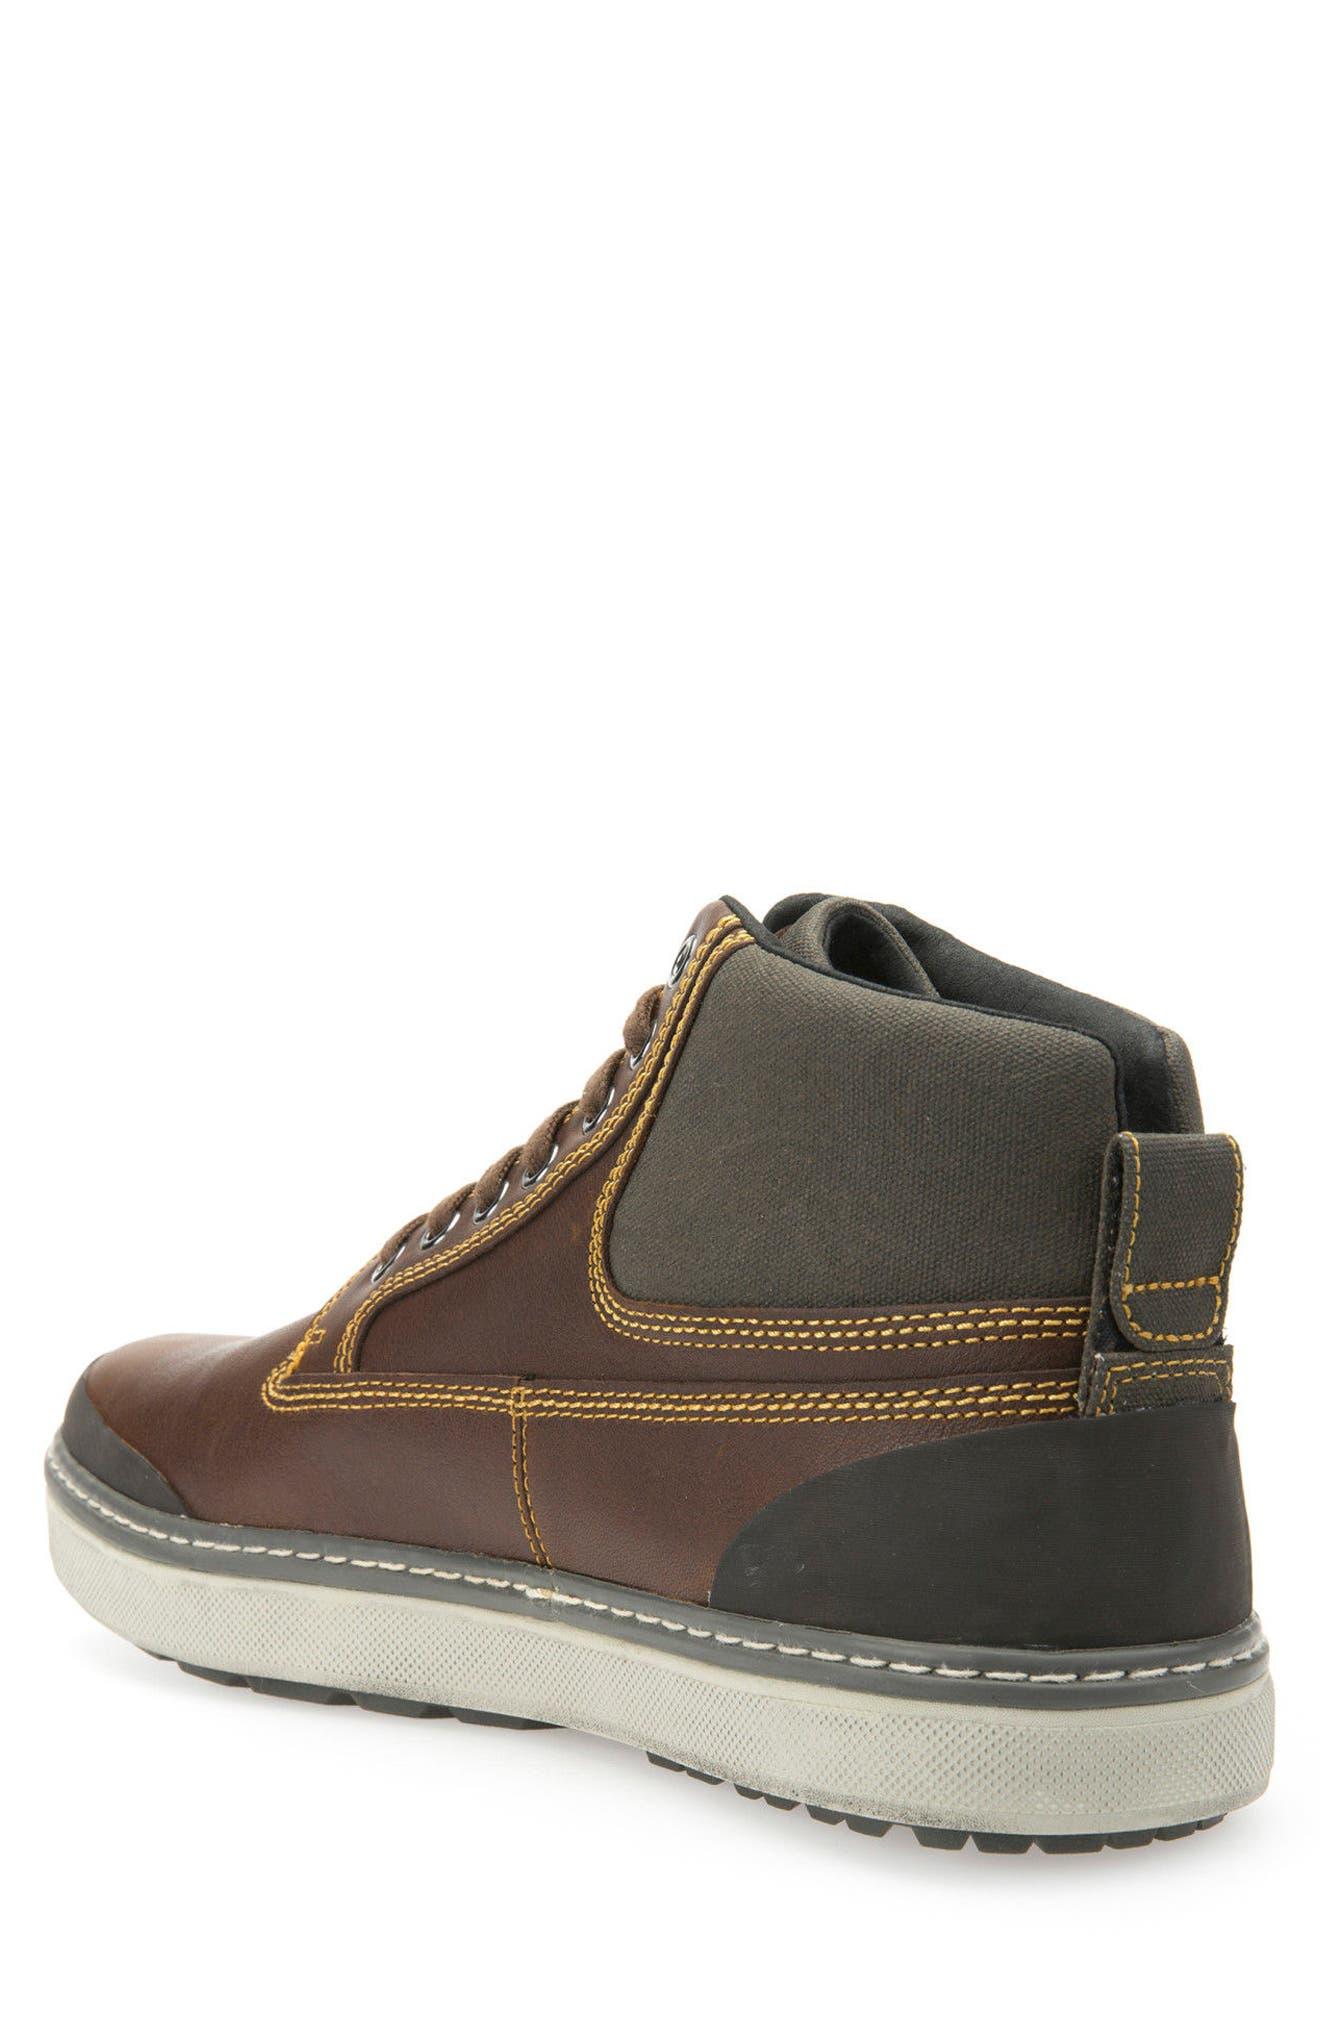 Mattias Amphibiox Waterproof Leather Sneaker,                             Alternate thumbnail 2, color,                             204